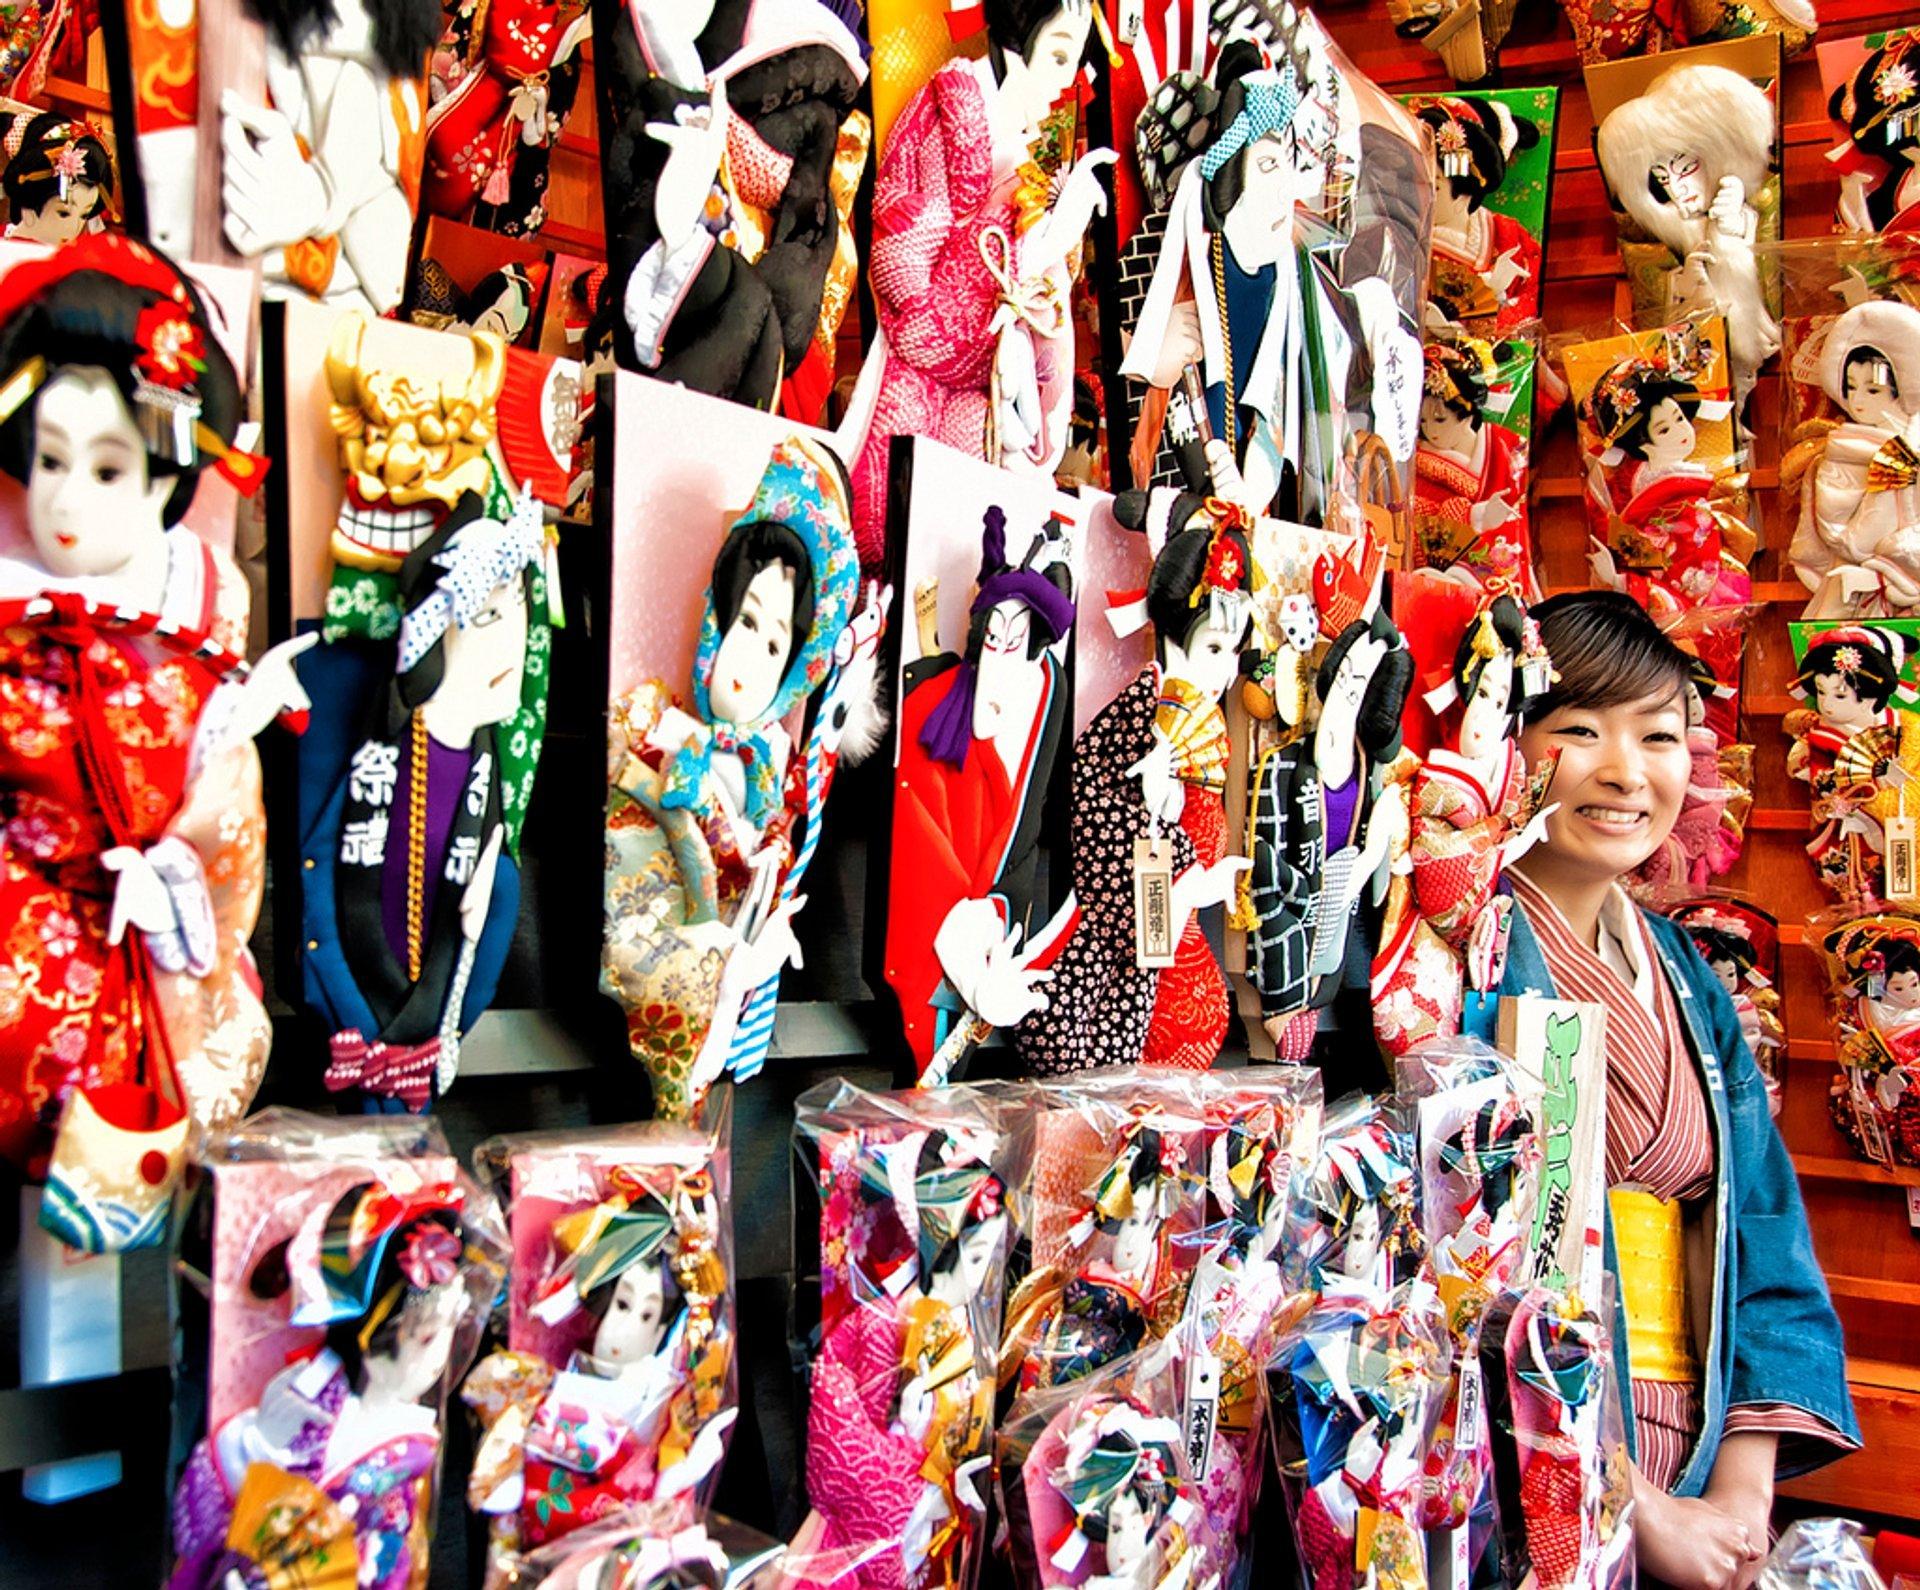 Senso-ji Hagoita-Ichi Fair in Tokyo 2020 - Best Time